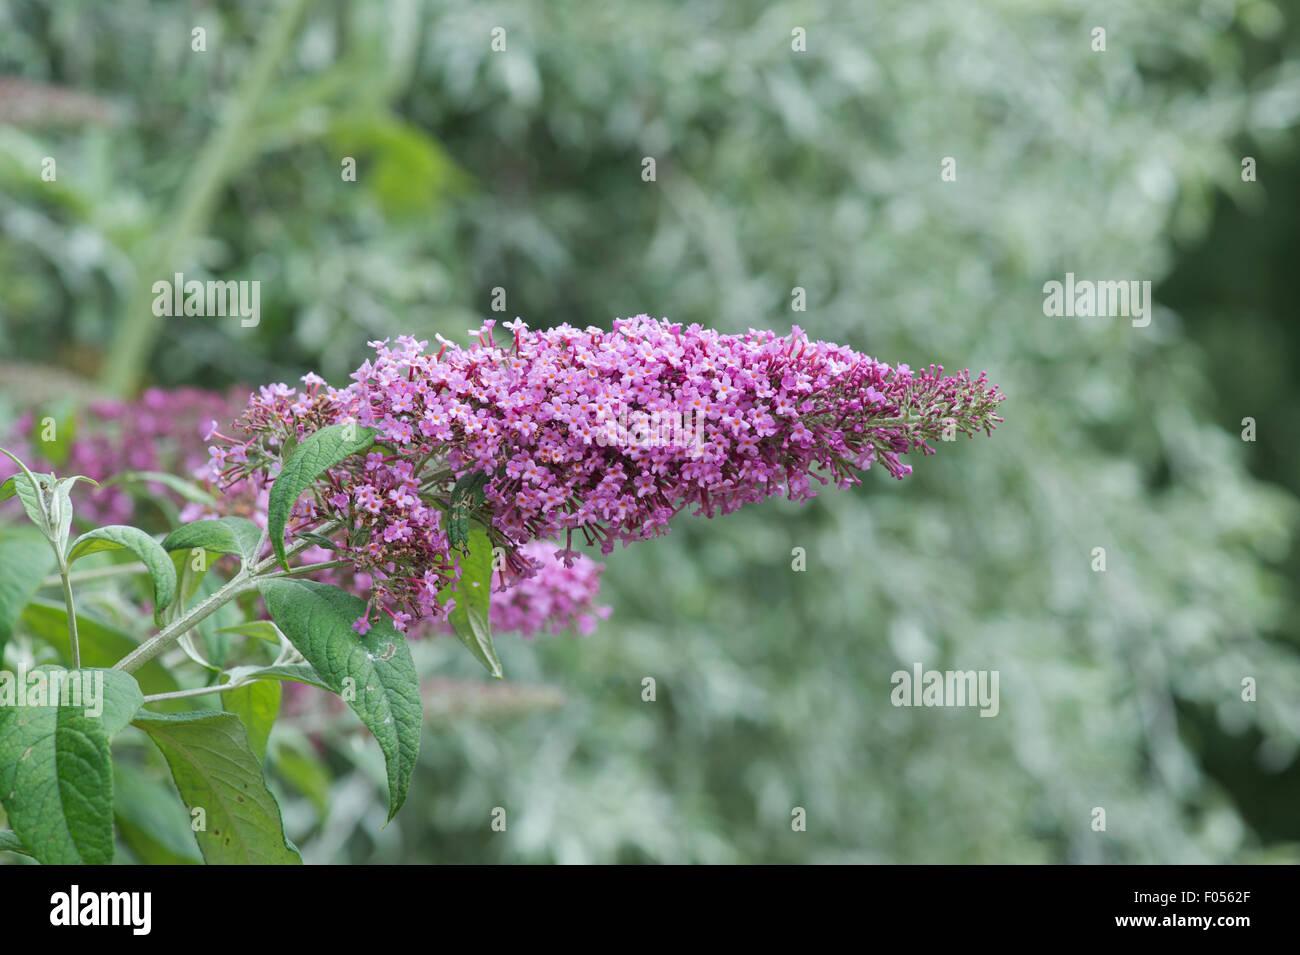 Buddleja Pikei 'Pink delight'. Butterfly bush 'Pink Delight' - Stock Image